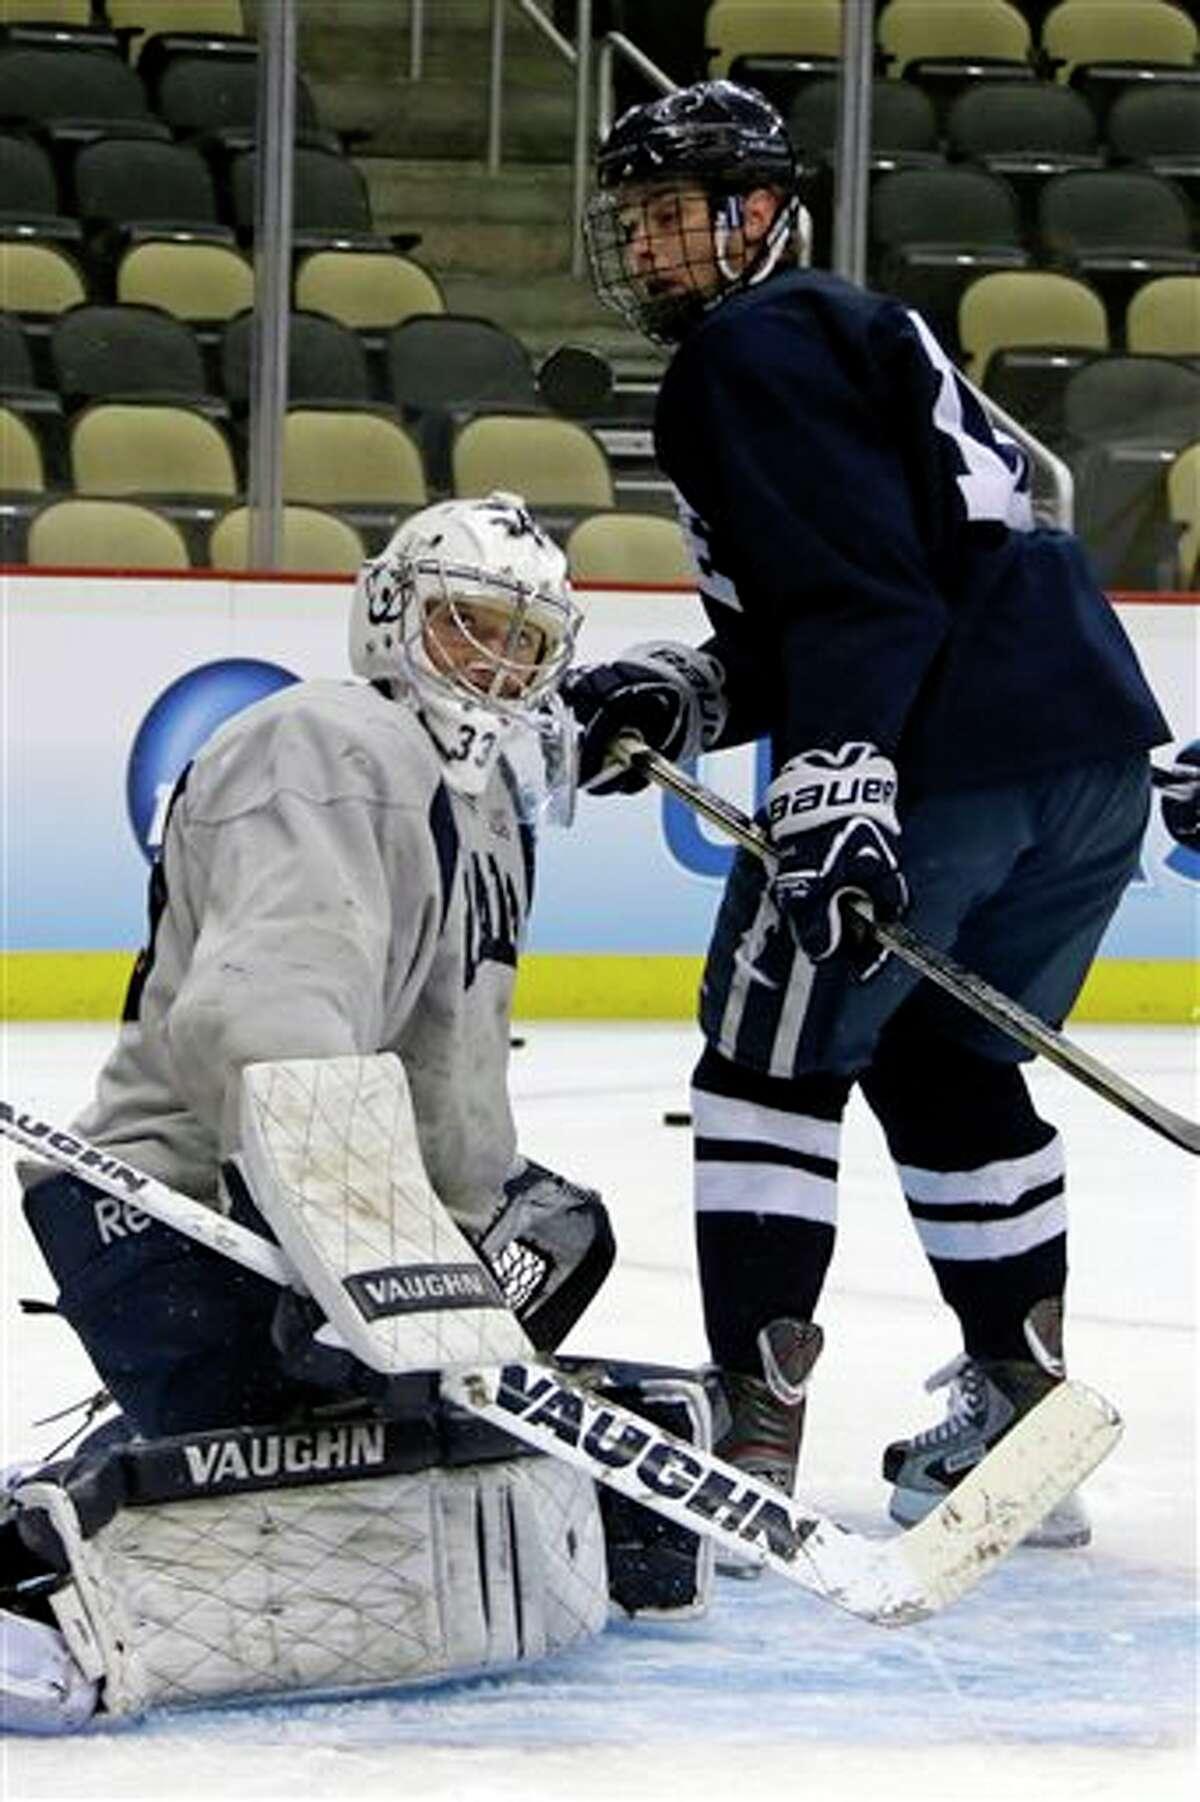 Yale goalie Jeff Malcolm, left, blocks a shot by teammate Clinton Bourbonais during an NCAA college hockey practice in Pittsburgh, Wednesday, April 10, 2013. (AP Photo/Gene J. Puskar)